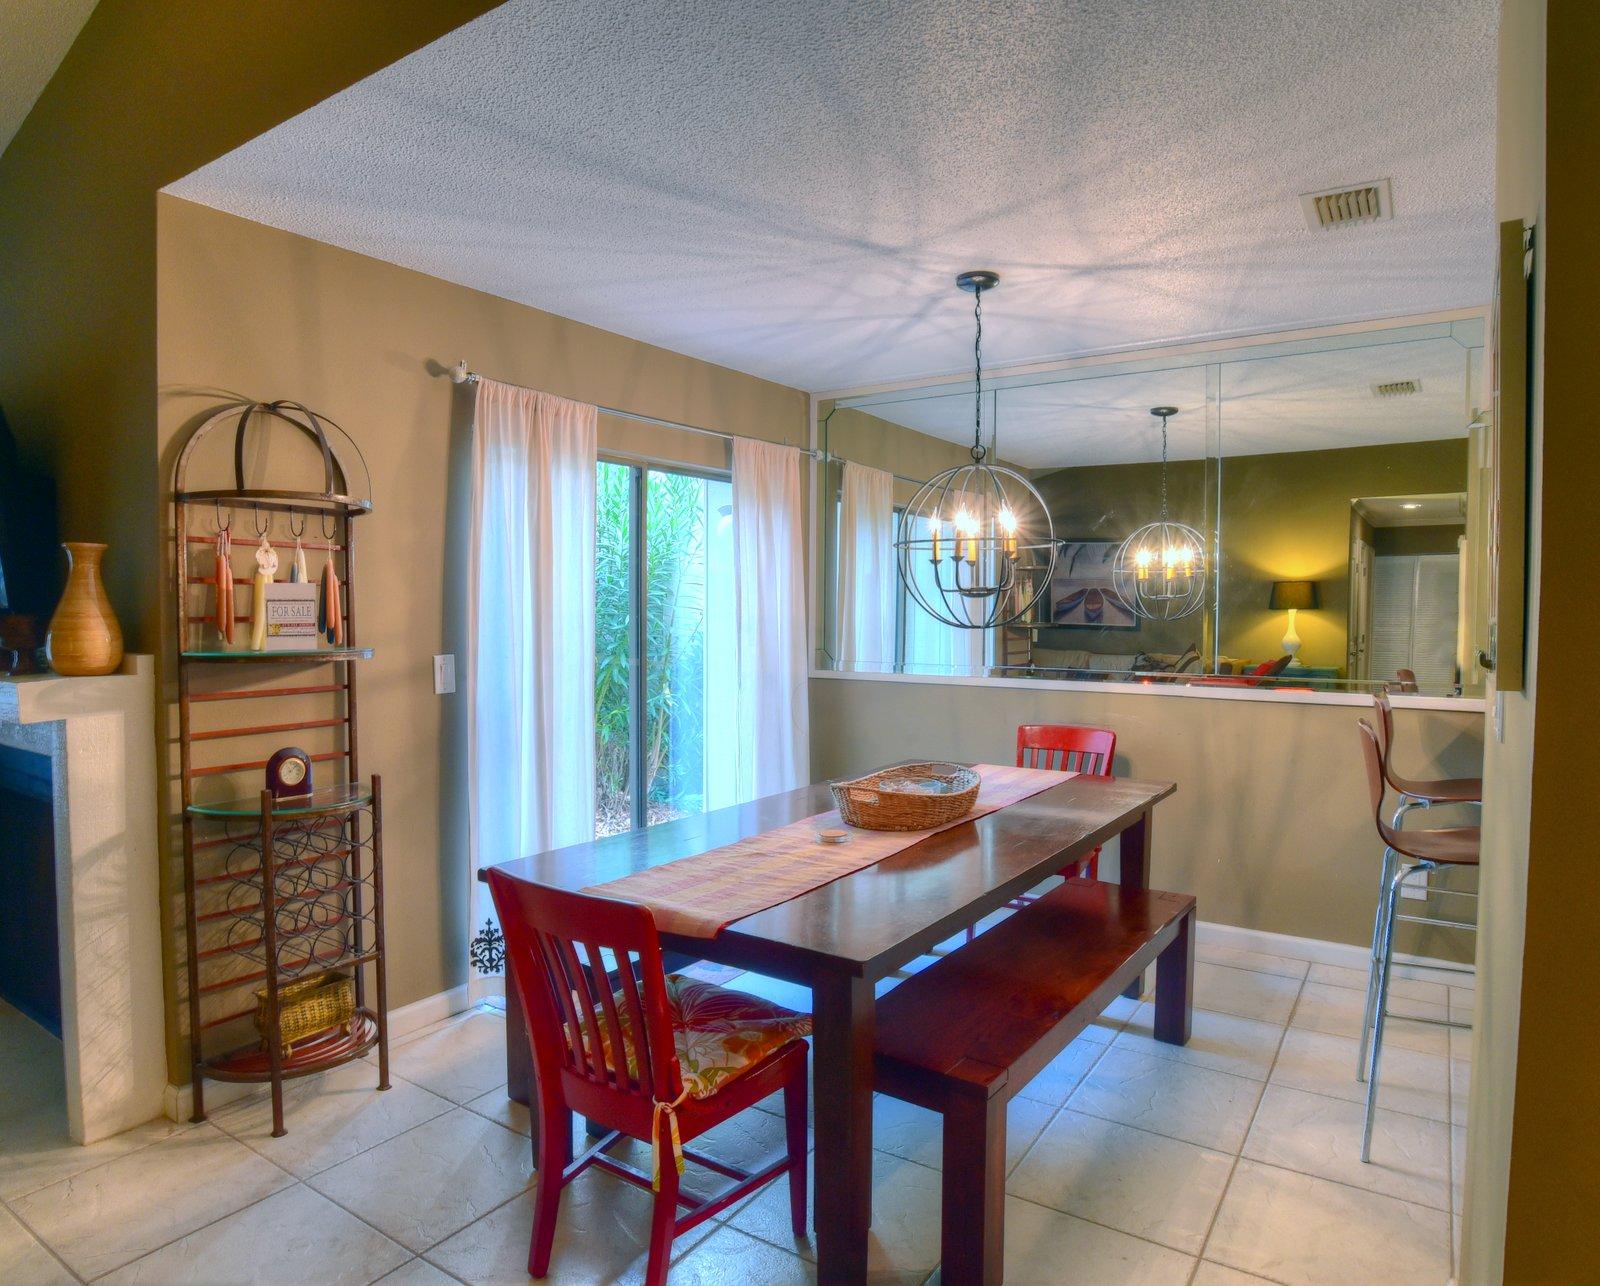 428 Linkside Condo rental in Sandestin Rentals ~ Cottages and Villas  in Destin Florida - #1